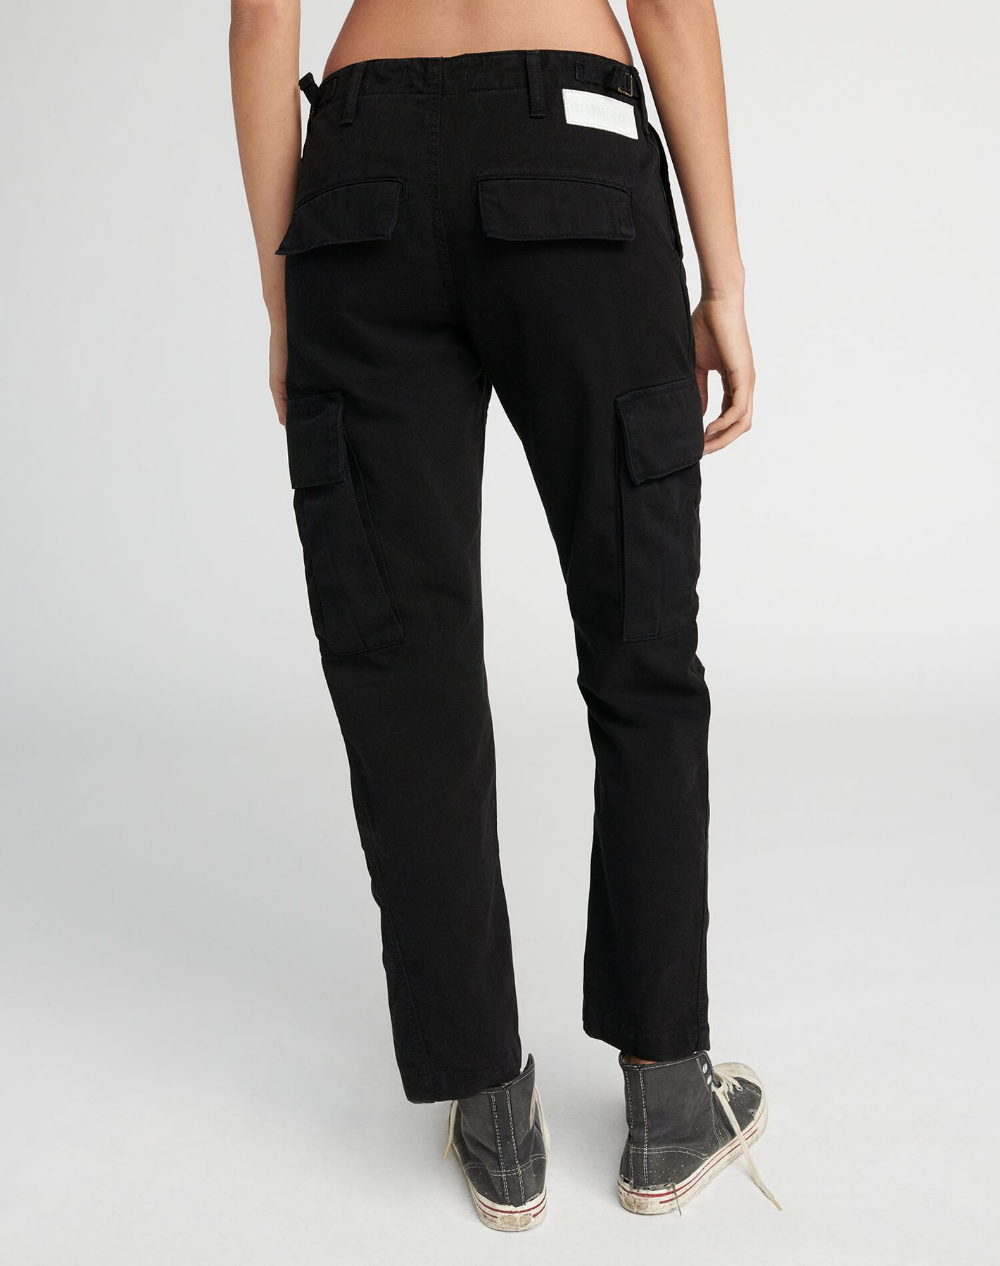 Cargo Pant Black White Cargo Pants Cargo Pants Pants